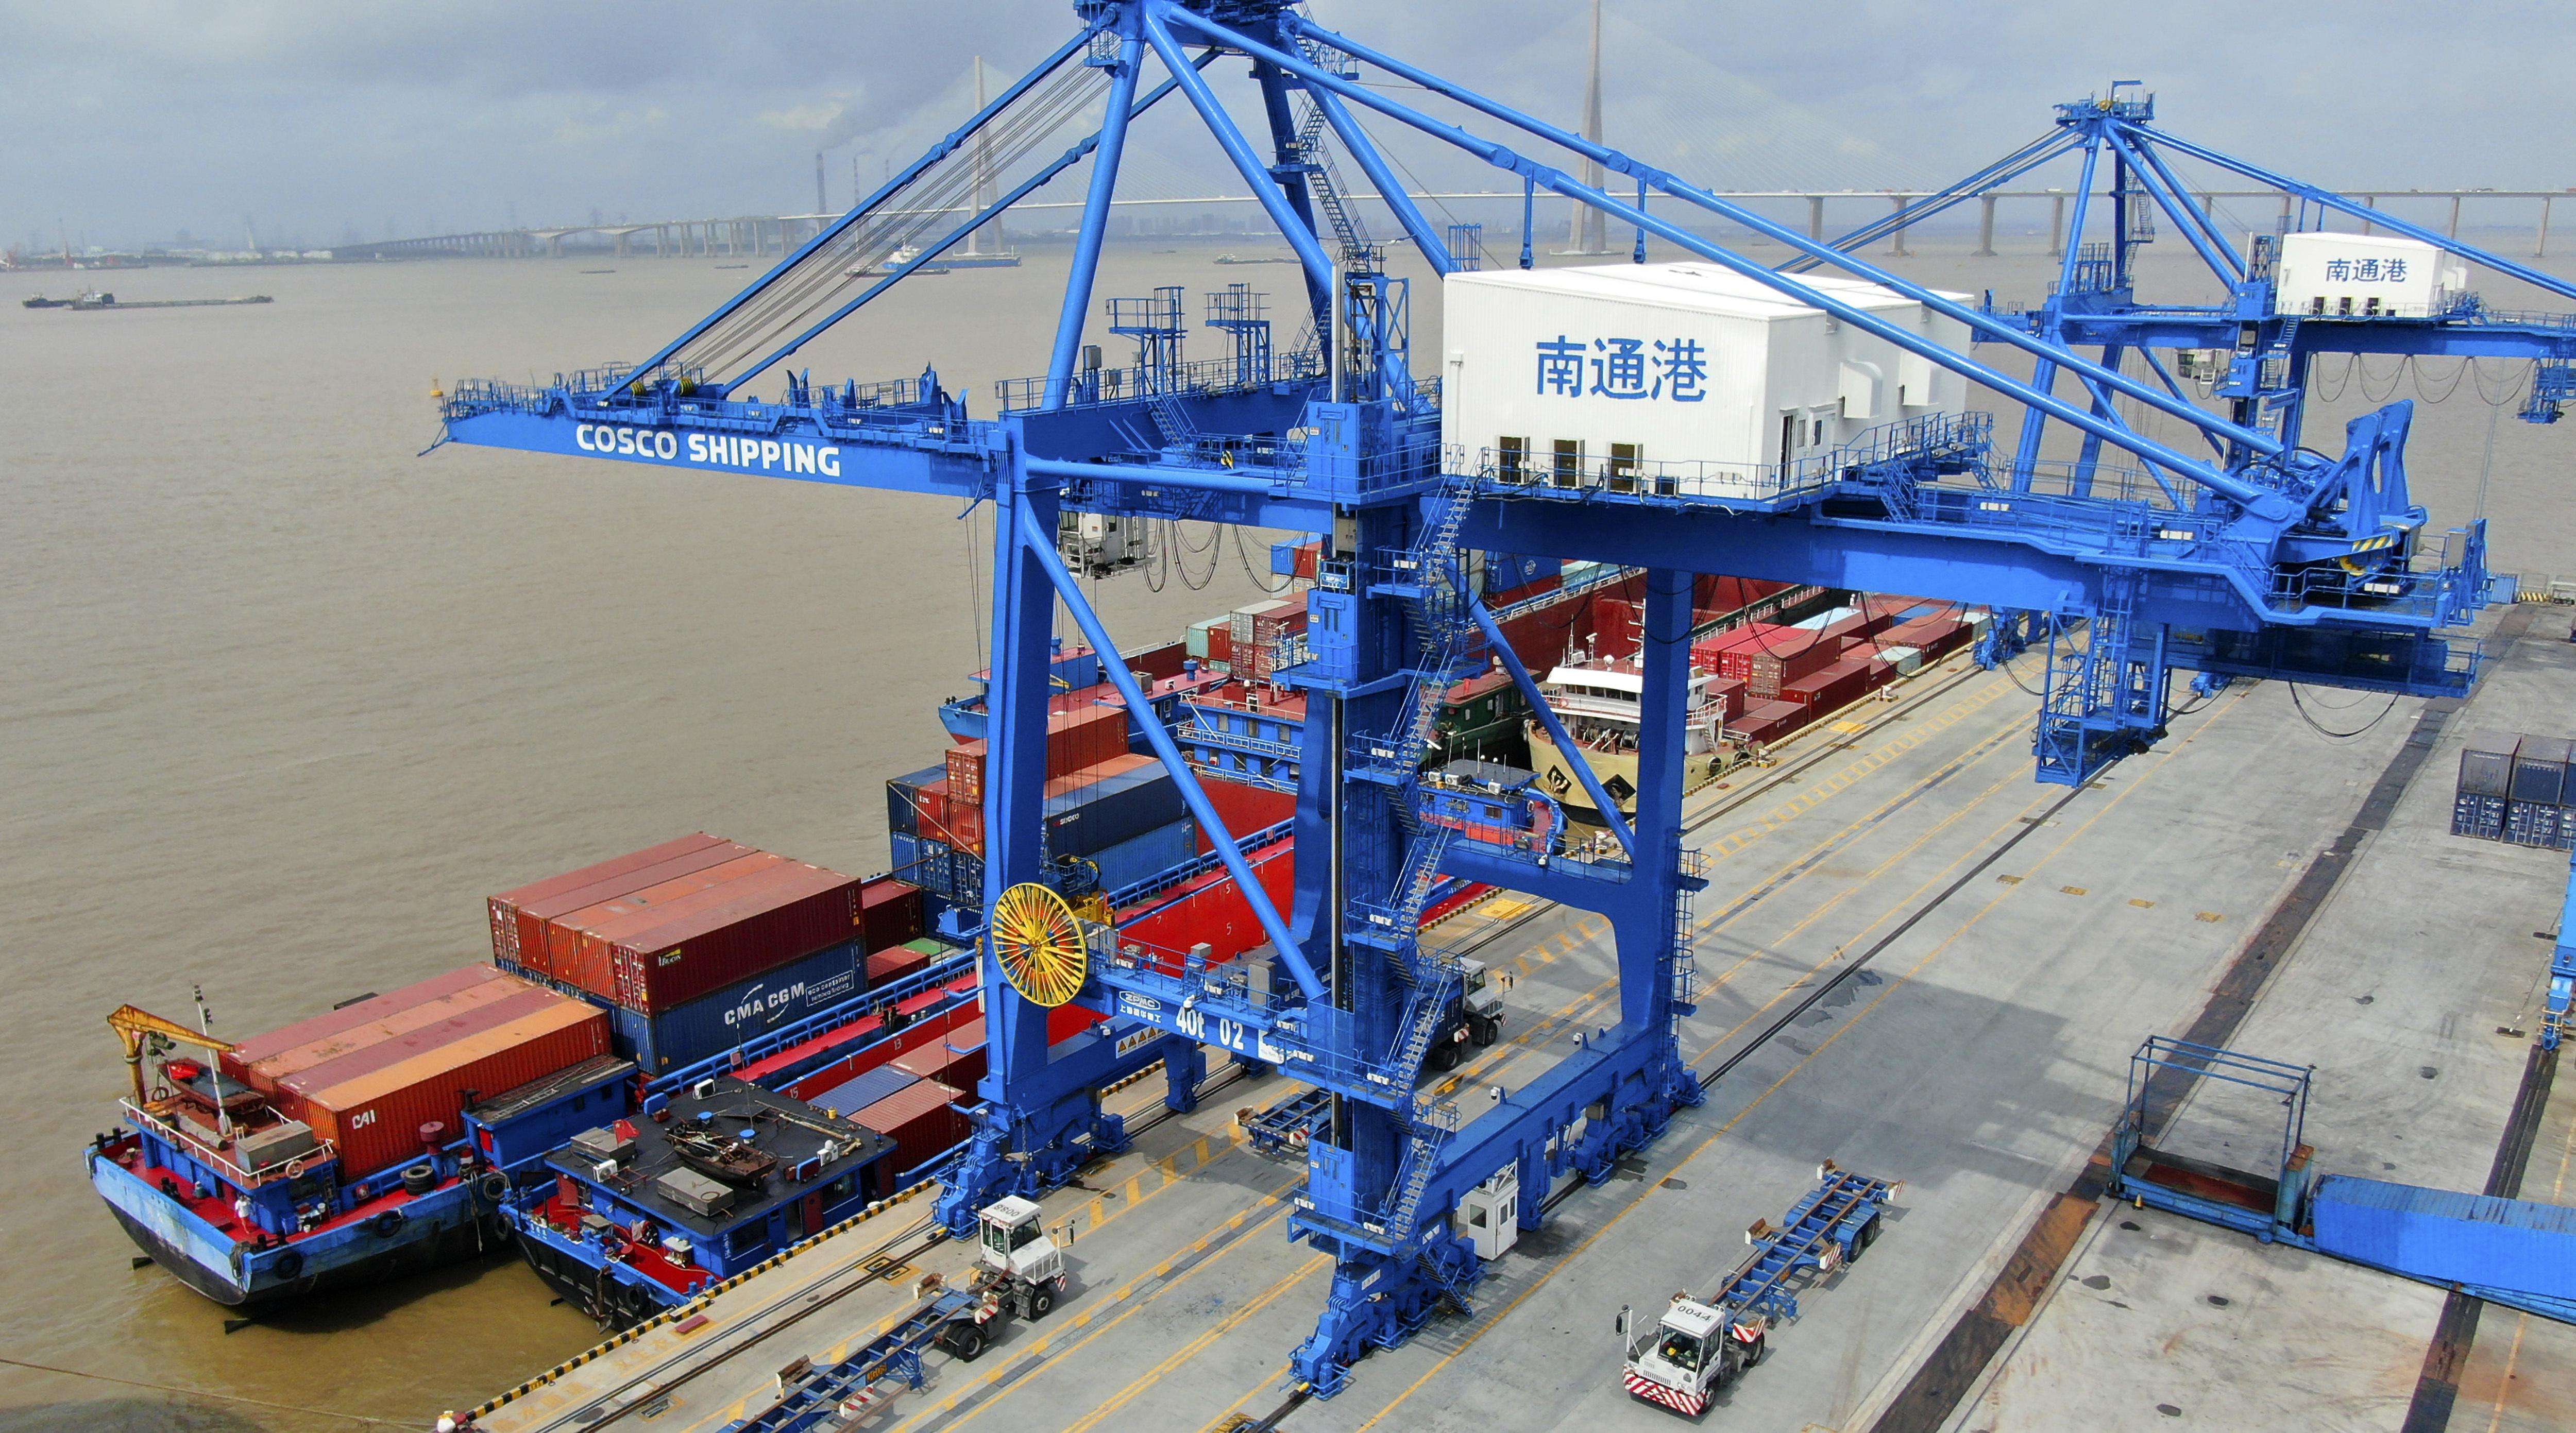 China wants trade talks but if US wants fight it will fight